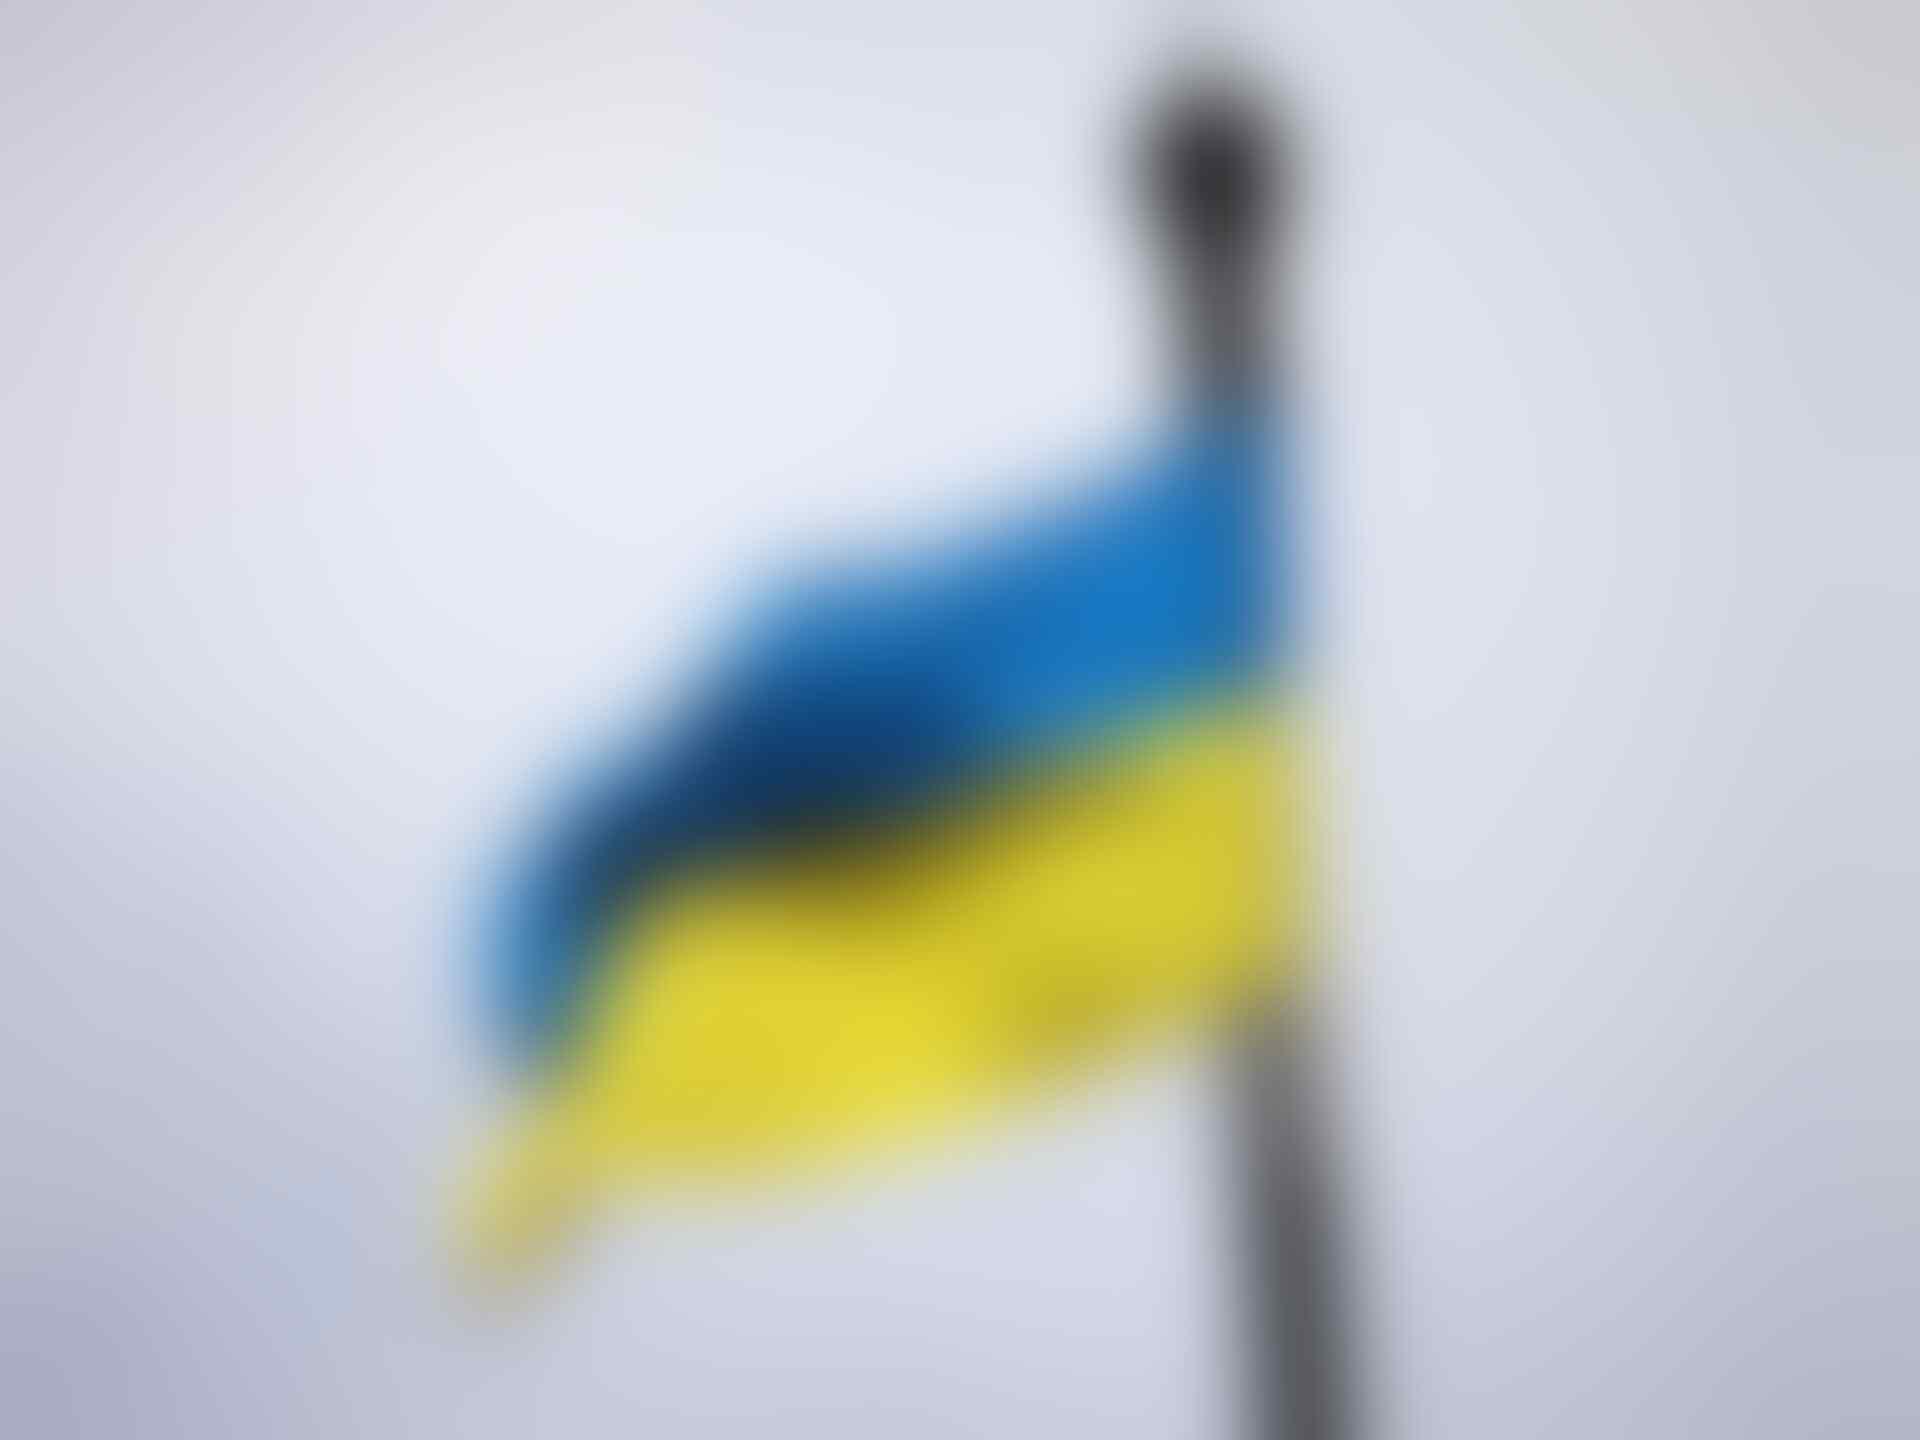 Gara-Gara Dukung Timnas Rusia, Kiper Klub Ukraina Dipecat